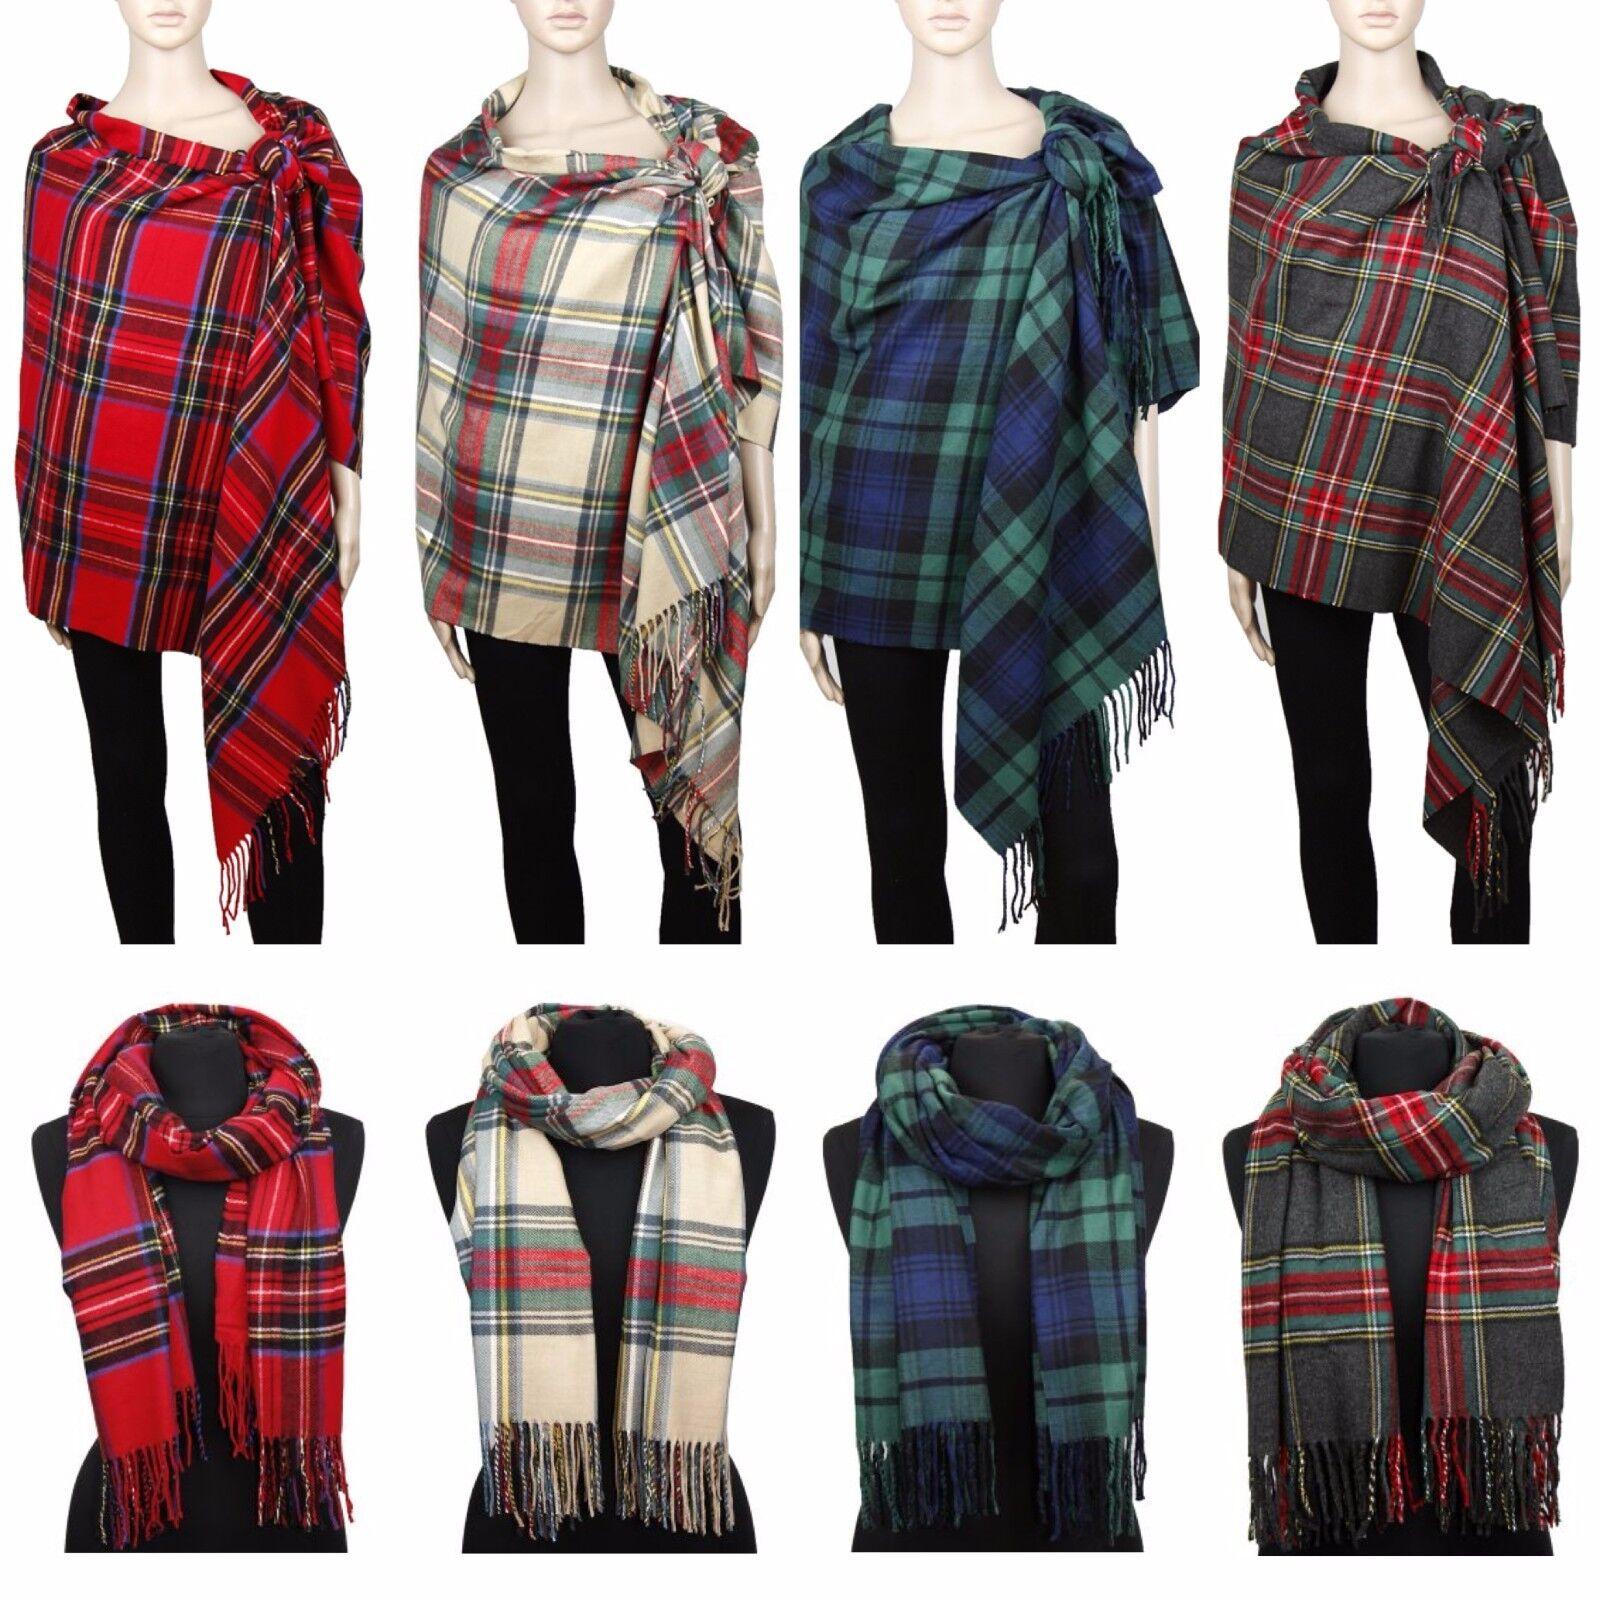 Scarf - Cashmere Feel Blanket Scarf Large Scottish Tartan Plaid Shawl Wrap Winter Warm